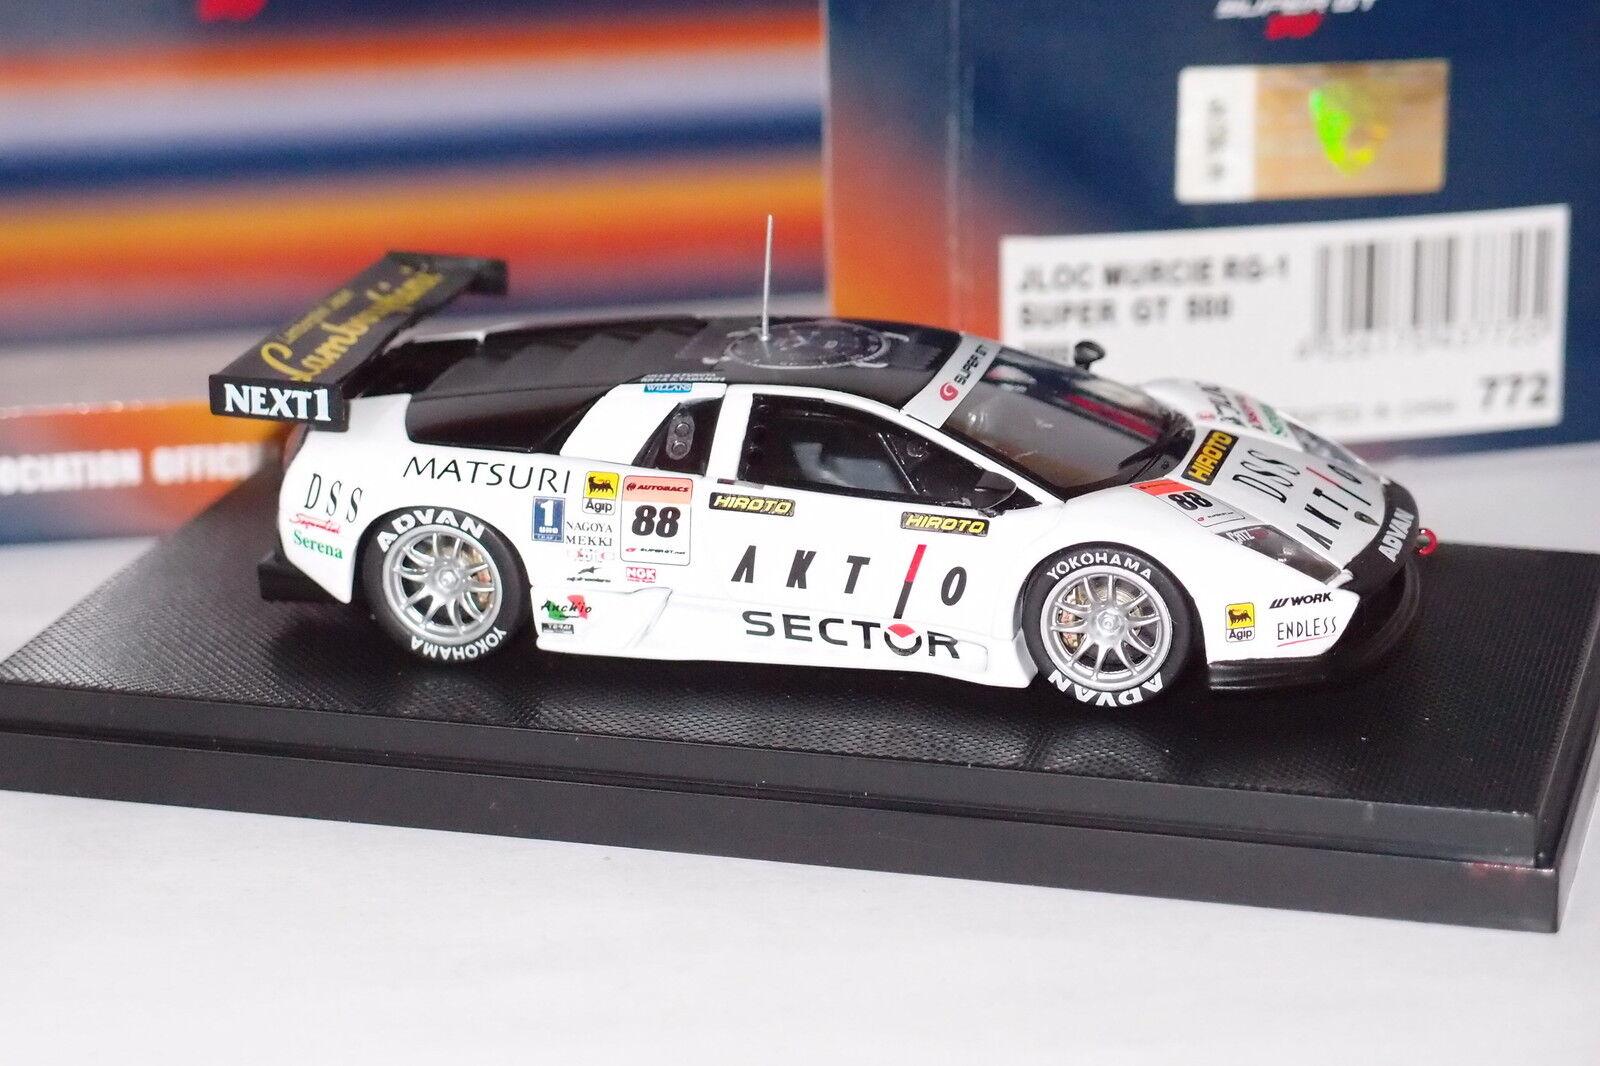 EBBRO LAMBORGHINI LAMBORGHINI LAMBORGHINI JLOC RG-1  SUPER GT 500 2005 WHITE REF 772 1 43 2c2feb